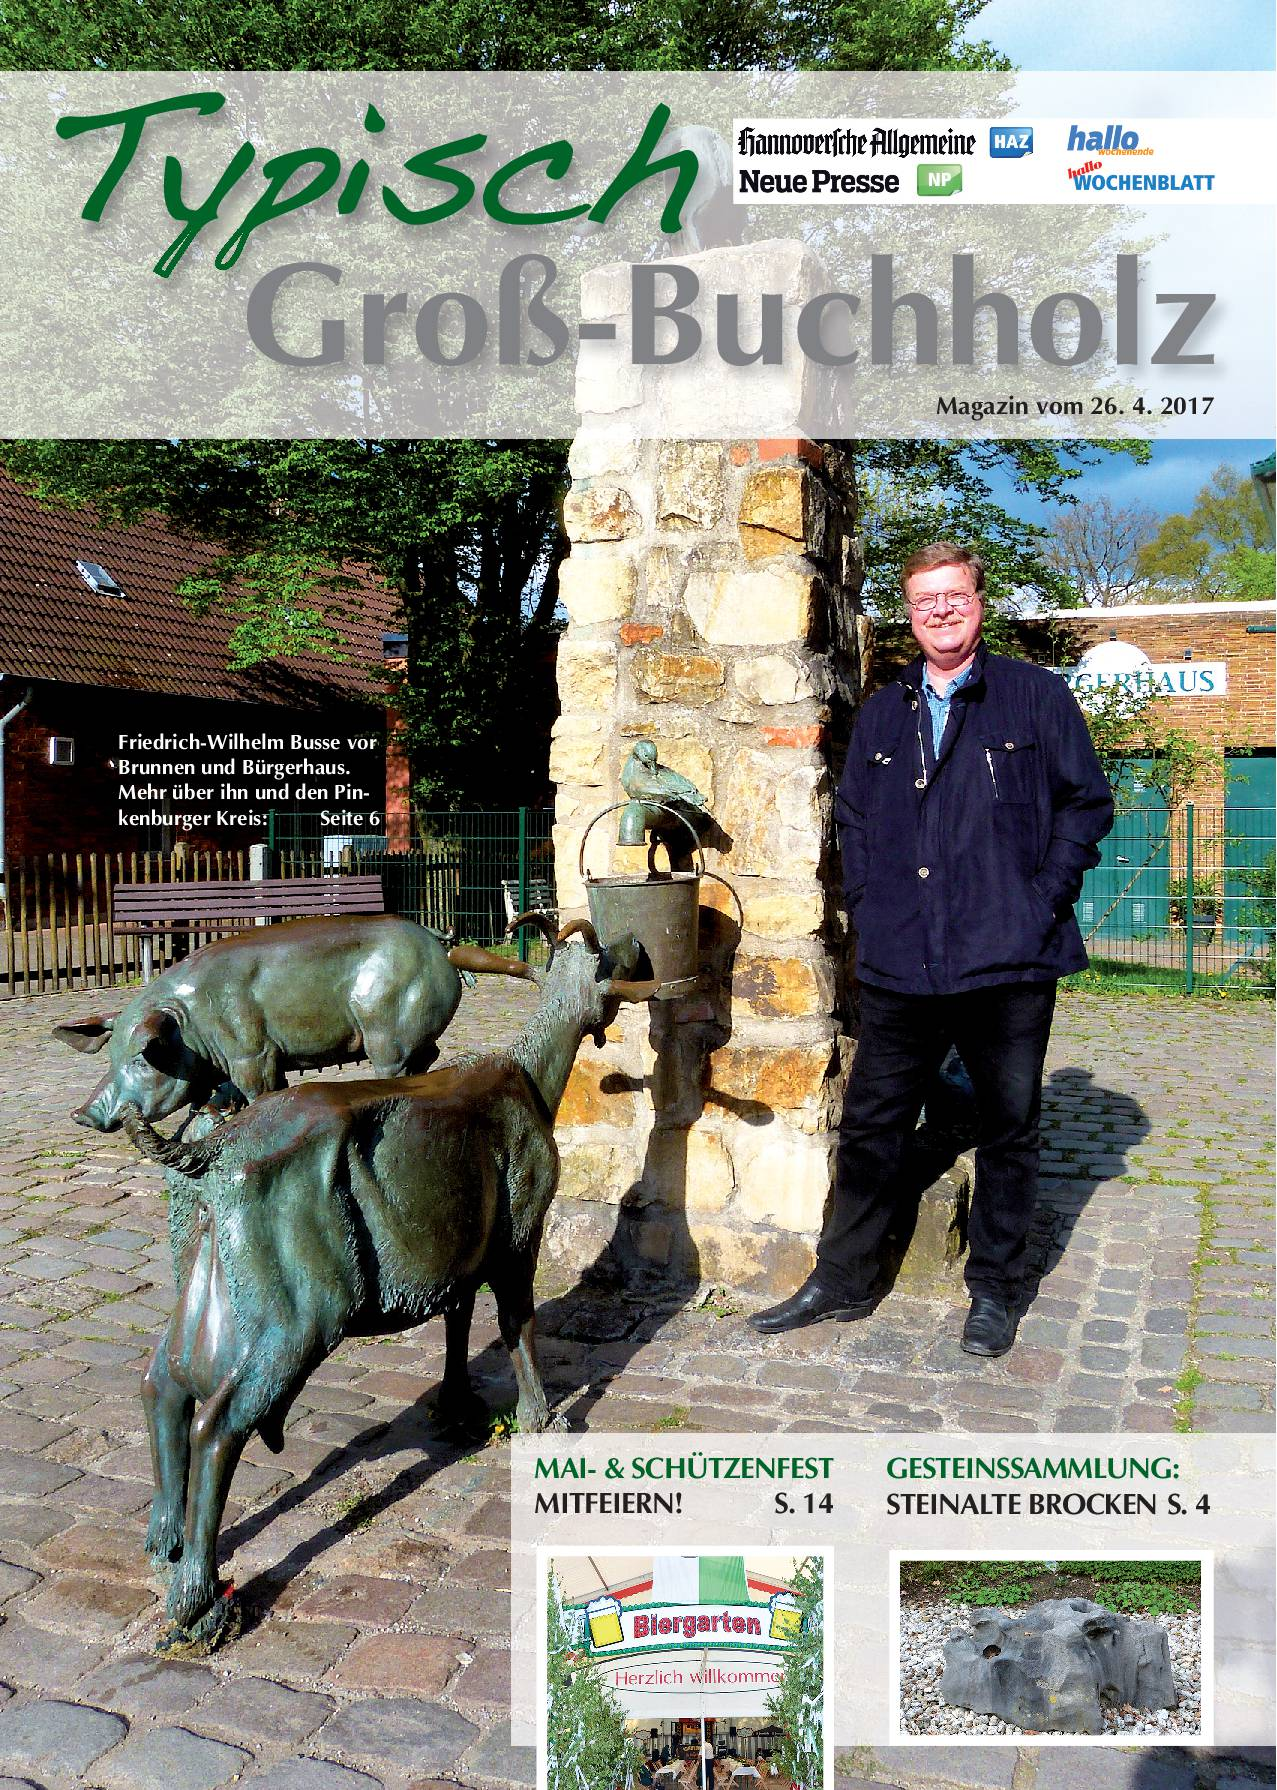 gross-buchholz-nr-2-vom-26-04-2017